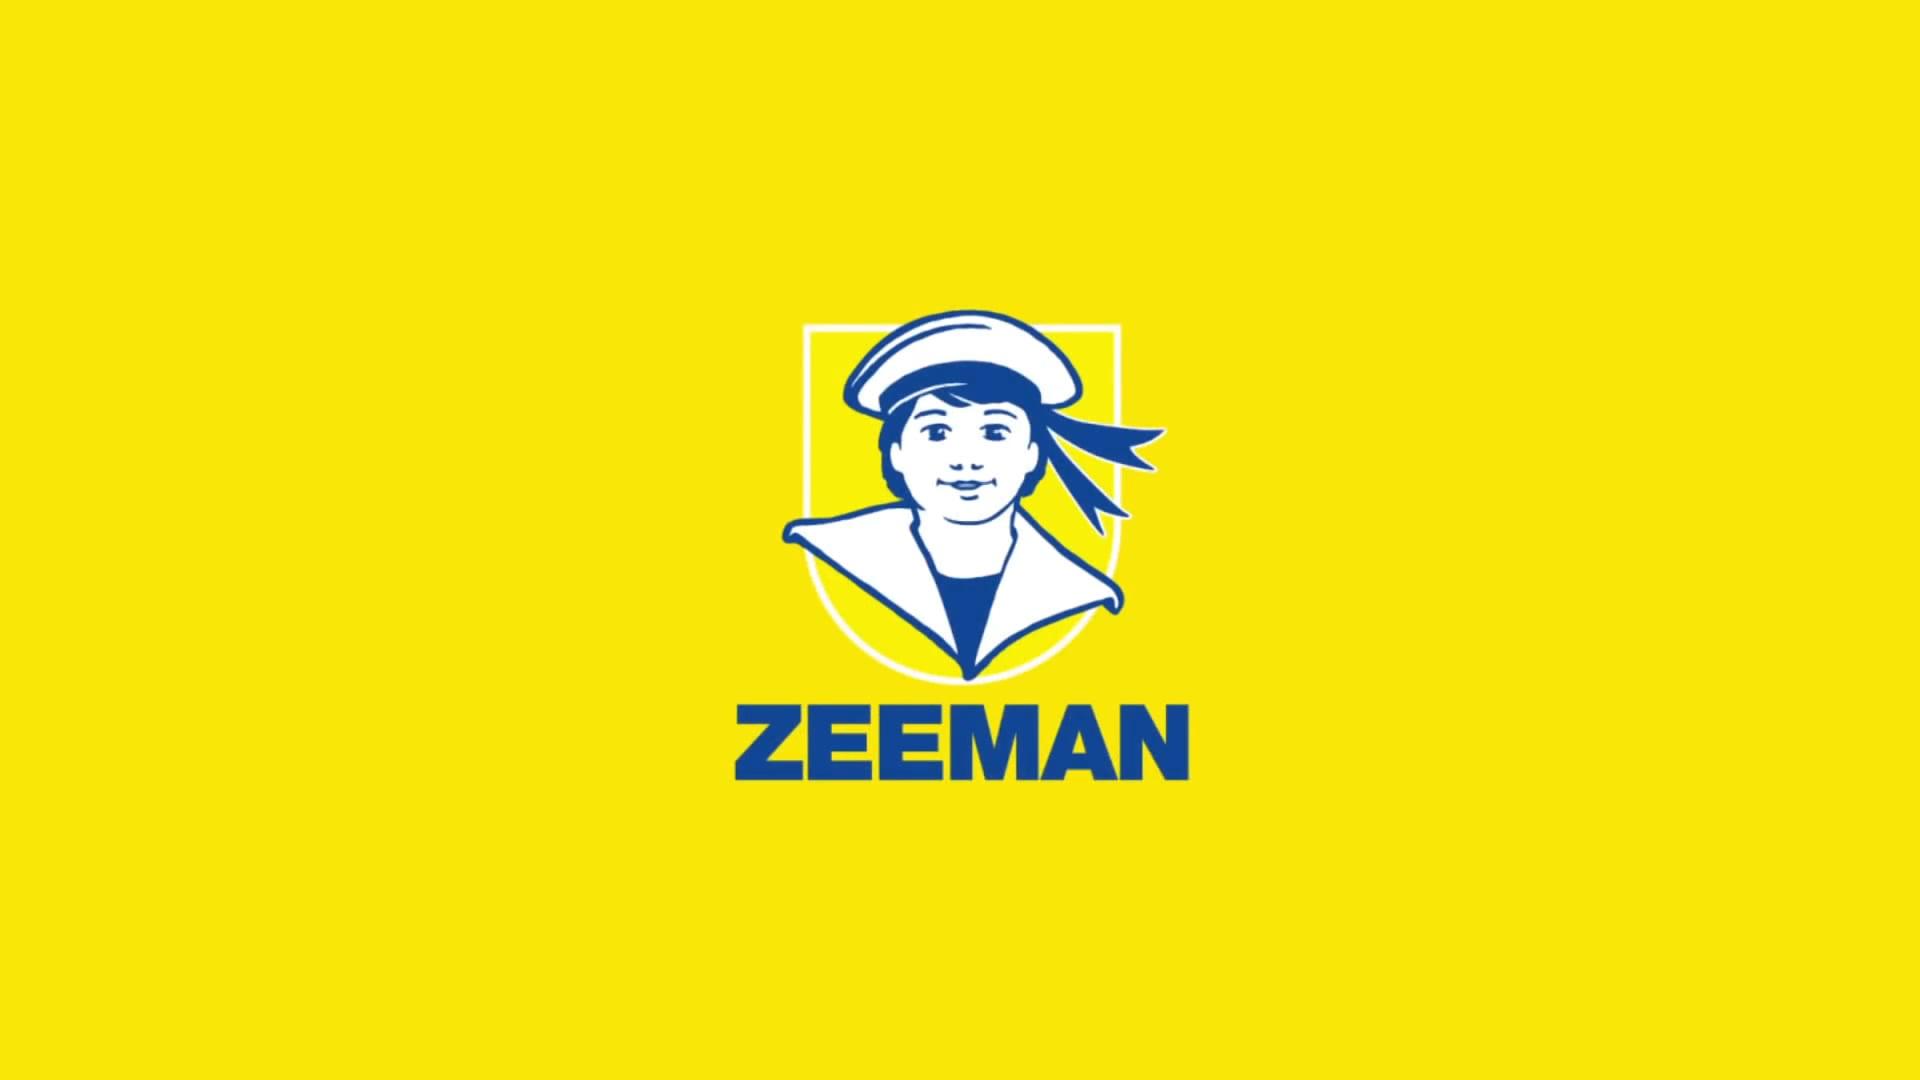 Zeeman guerrilla stunt op Amsterdam Fashion Week (full story)